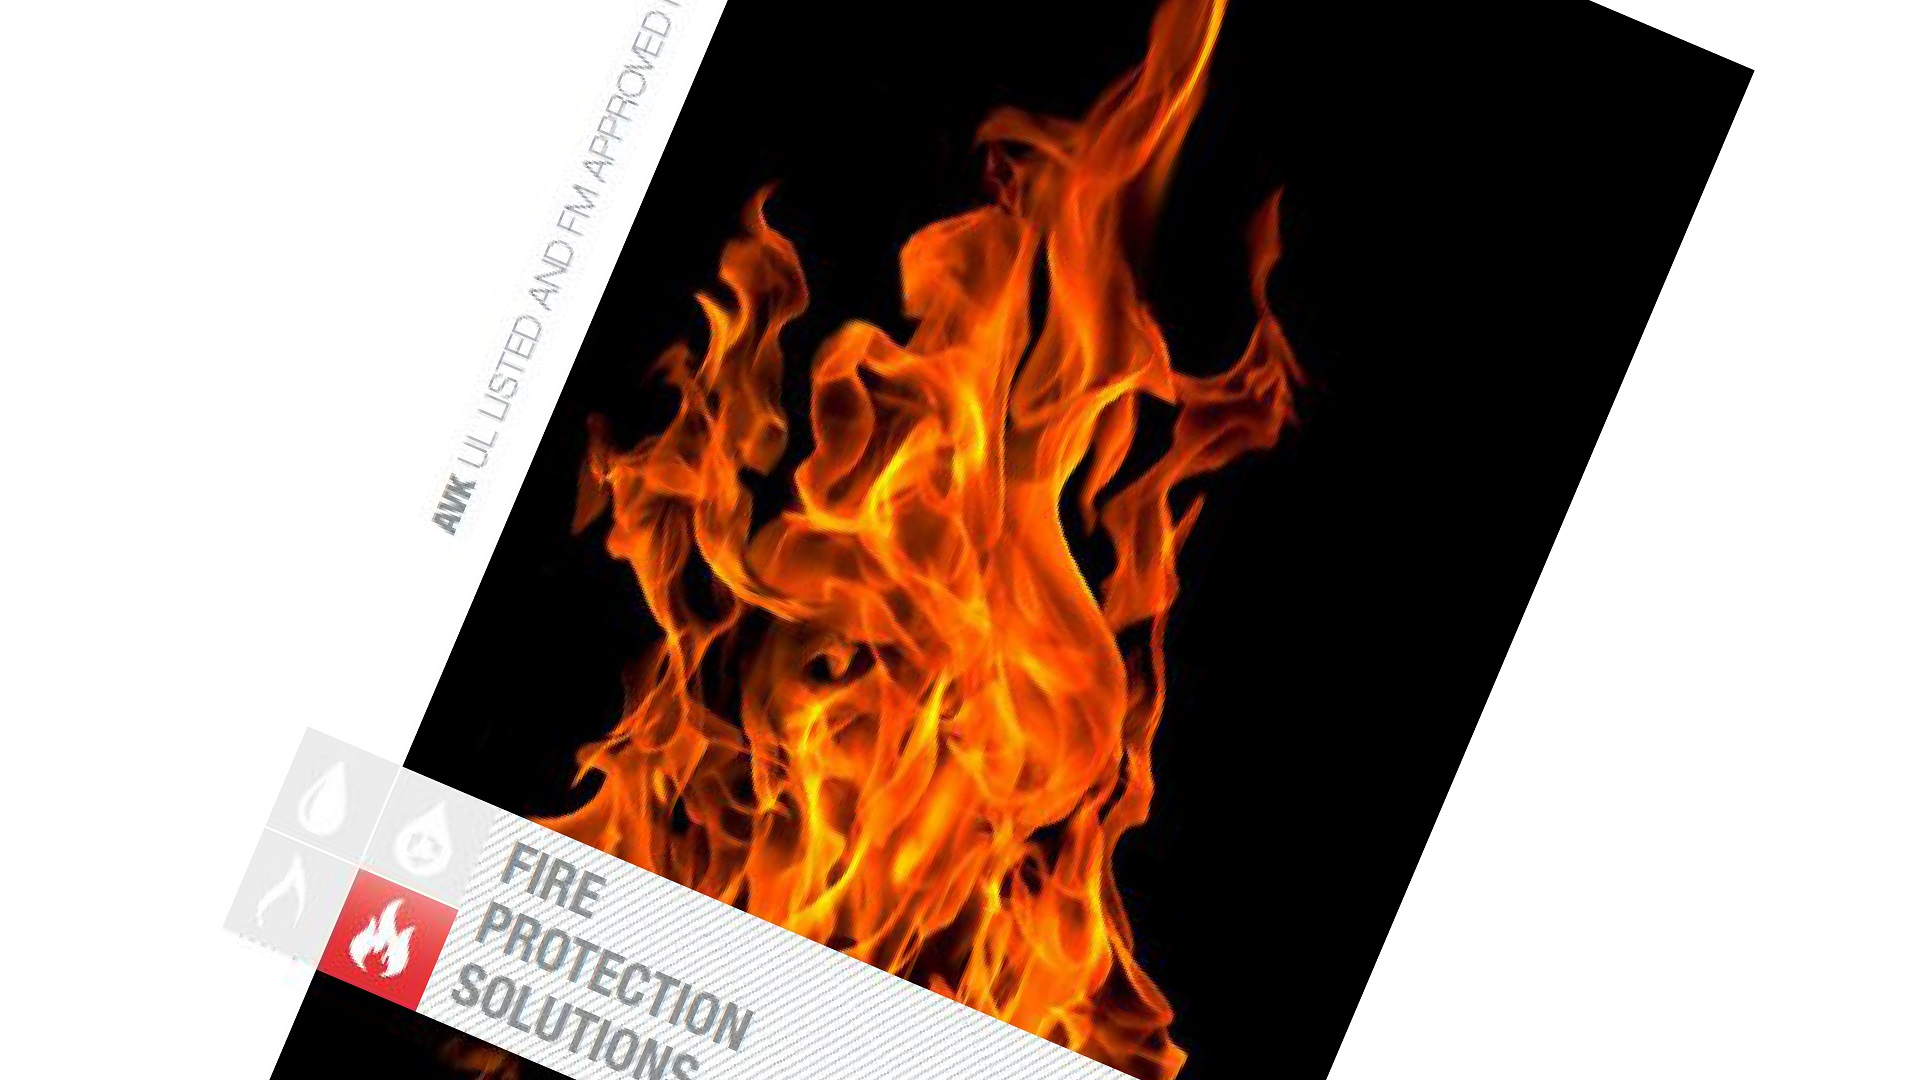 AVK Fire Protection Brochure